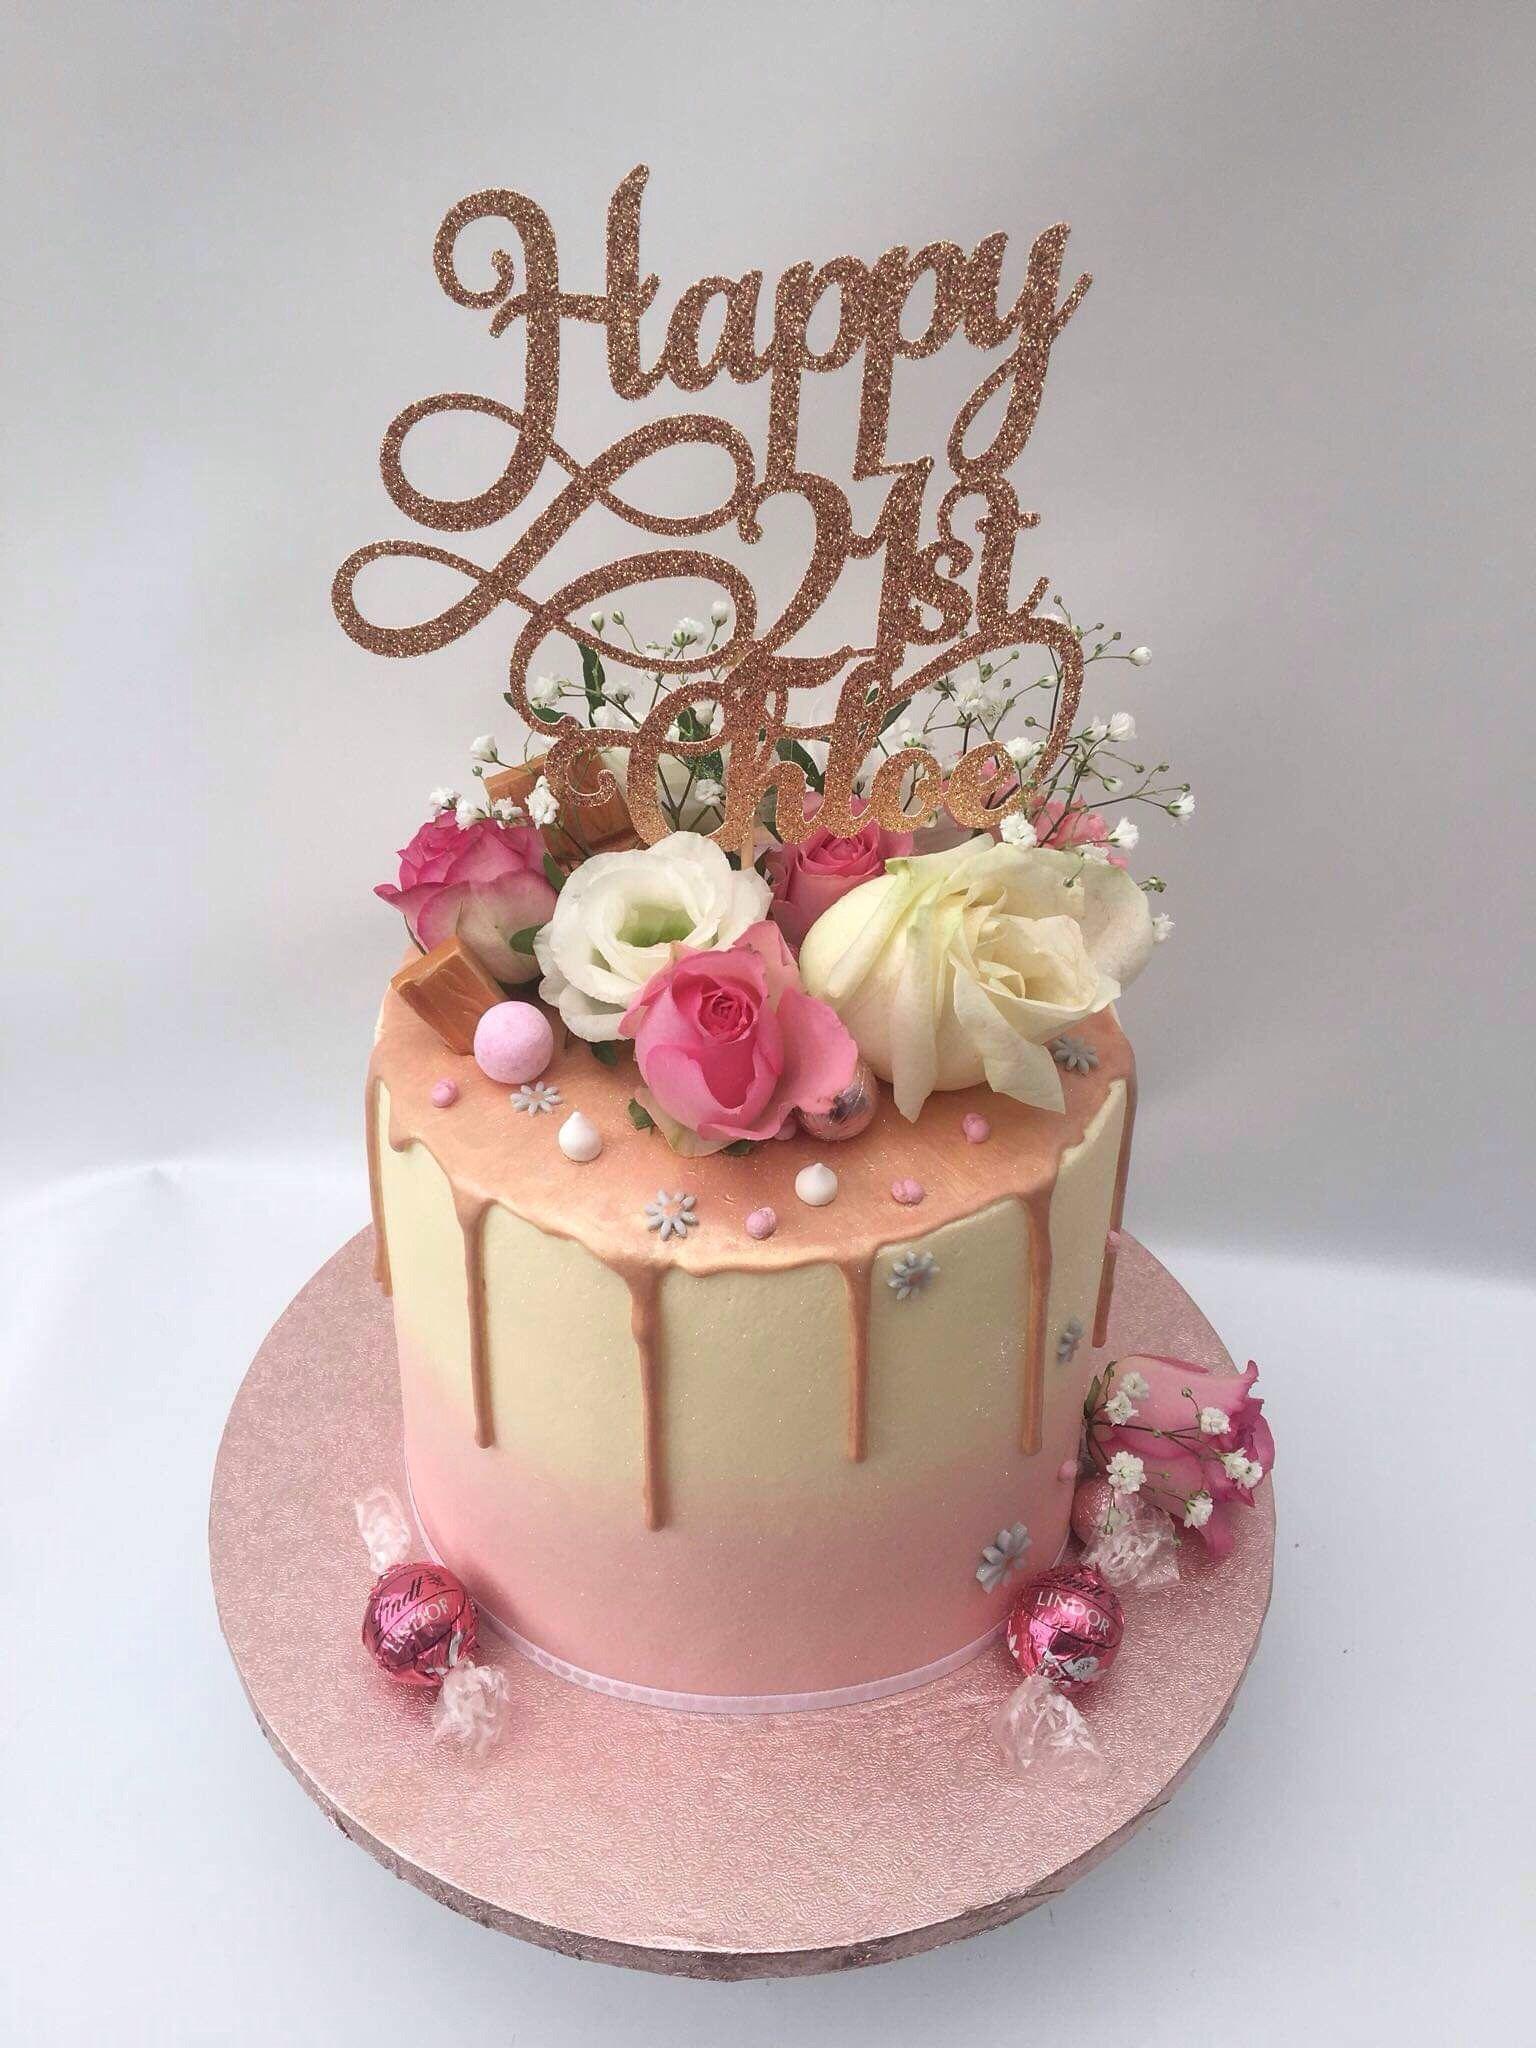 Pin By Aimee Claire De Villiers On Danielle Wedding Cake Ideas